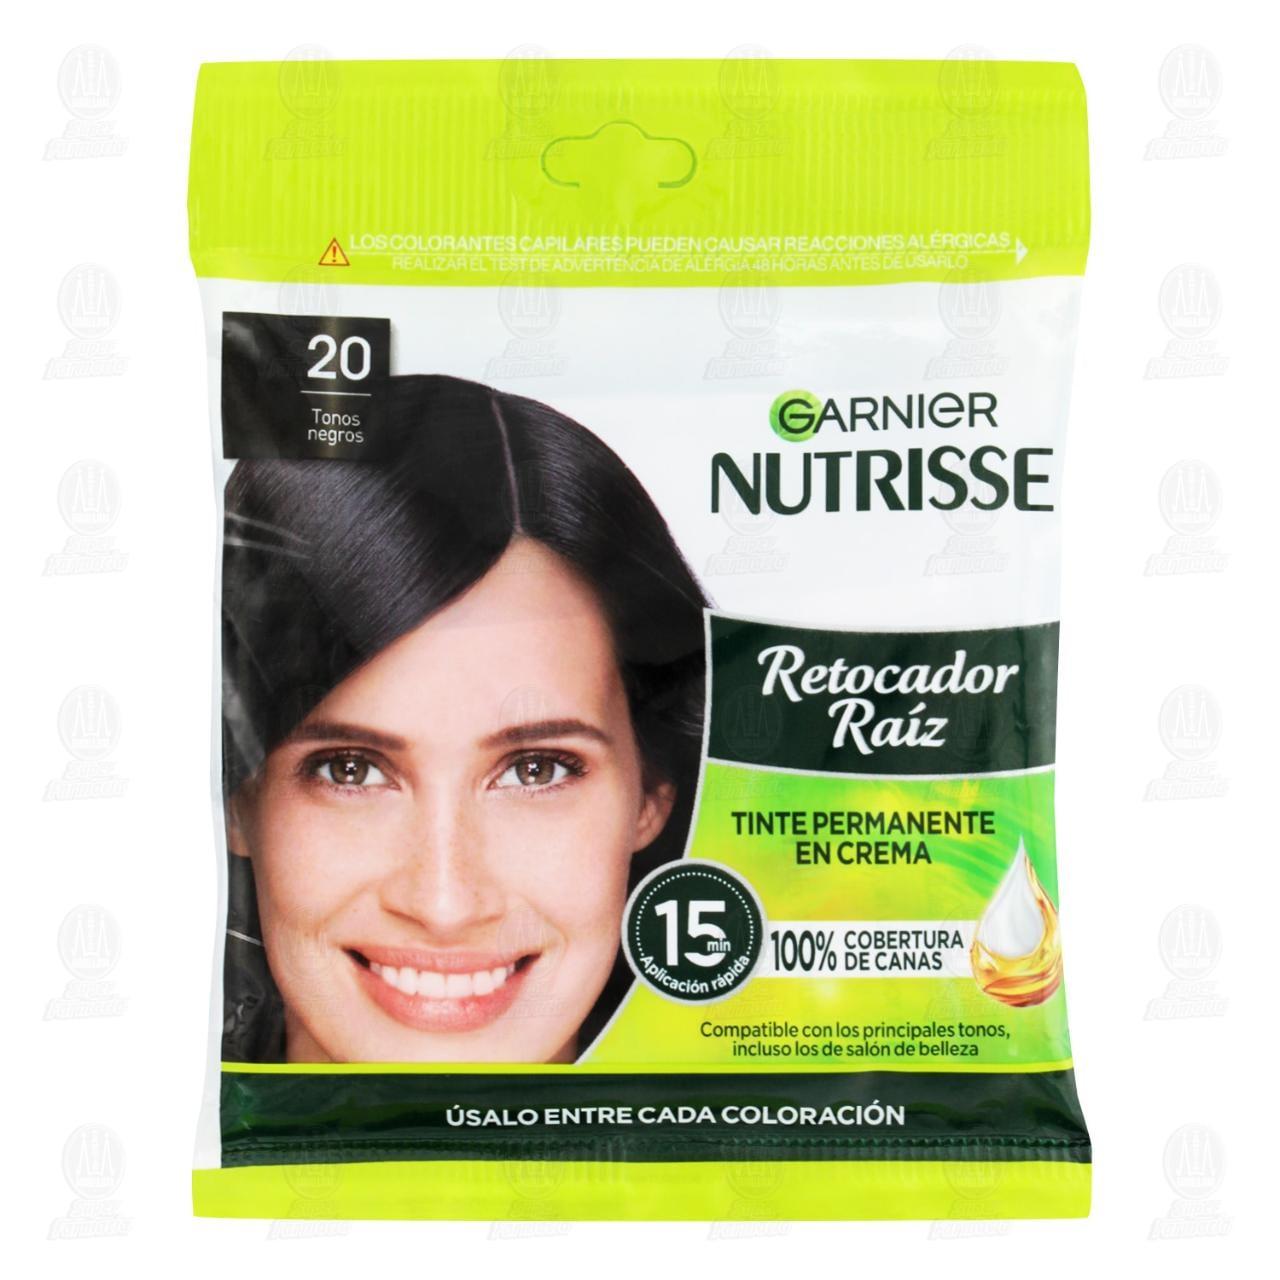 comprar https://www.movil.farmaciasguadalajara.com/wcsstore/FGCAS/wcs/products/1346687_S_1280_F.jpg en farmacias guadalajara